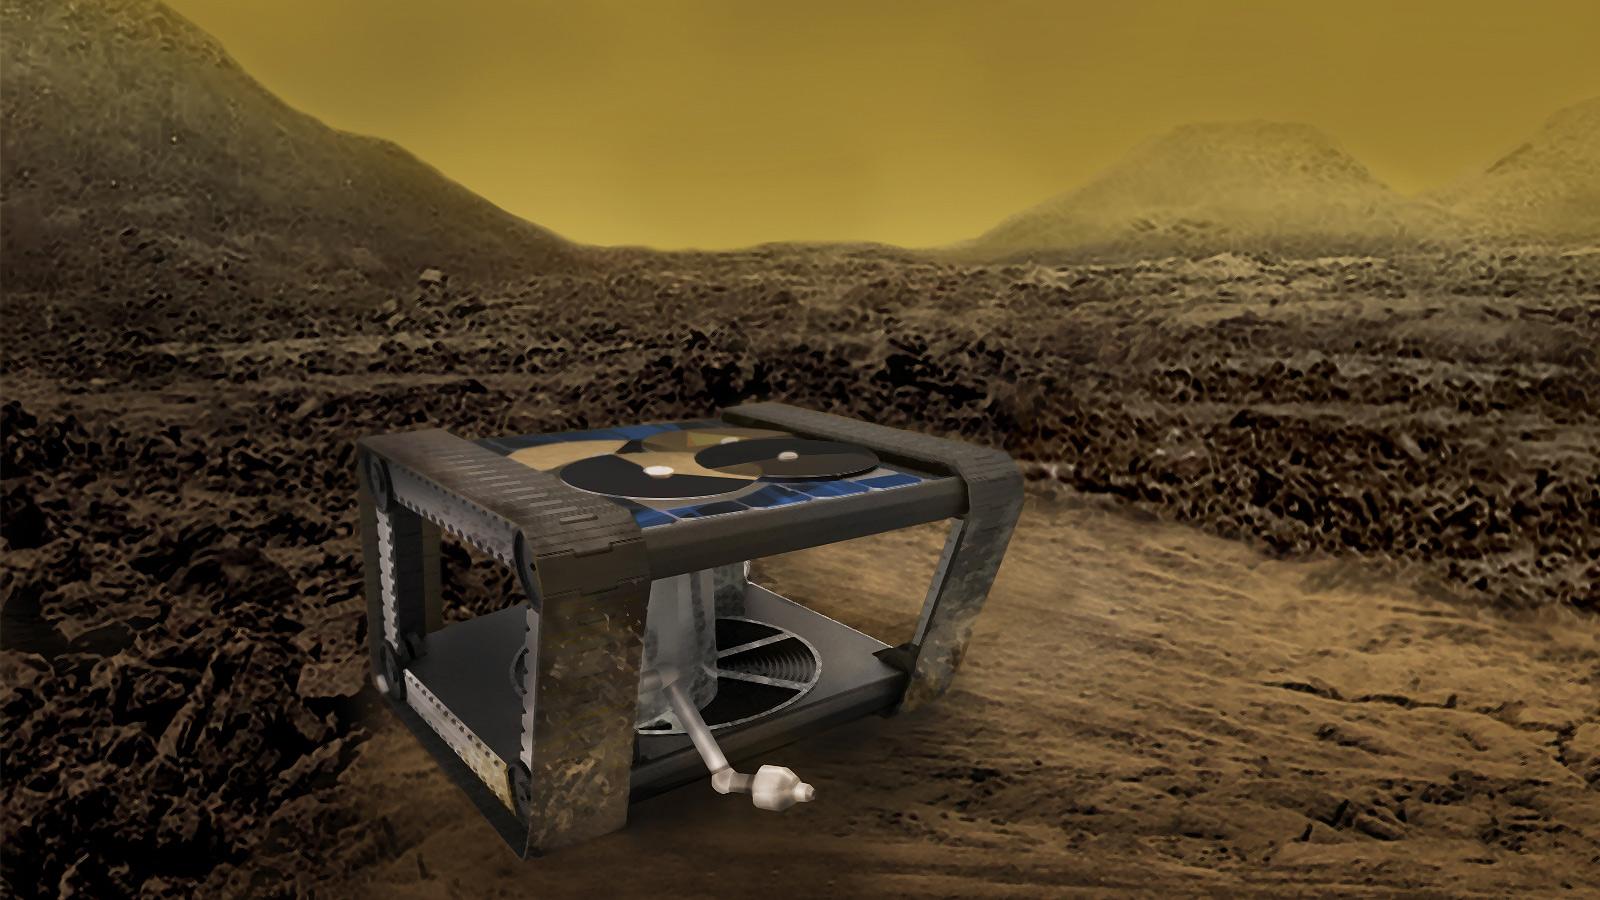 Концепт планетохода AREE для исследований Венеры.